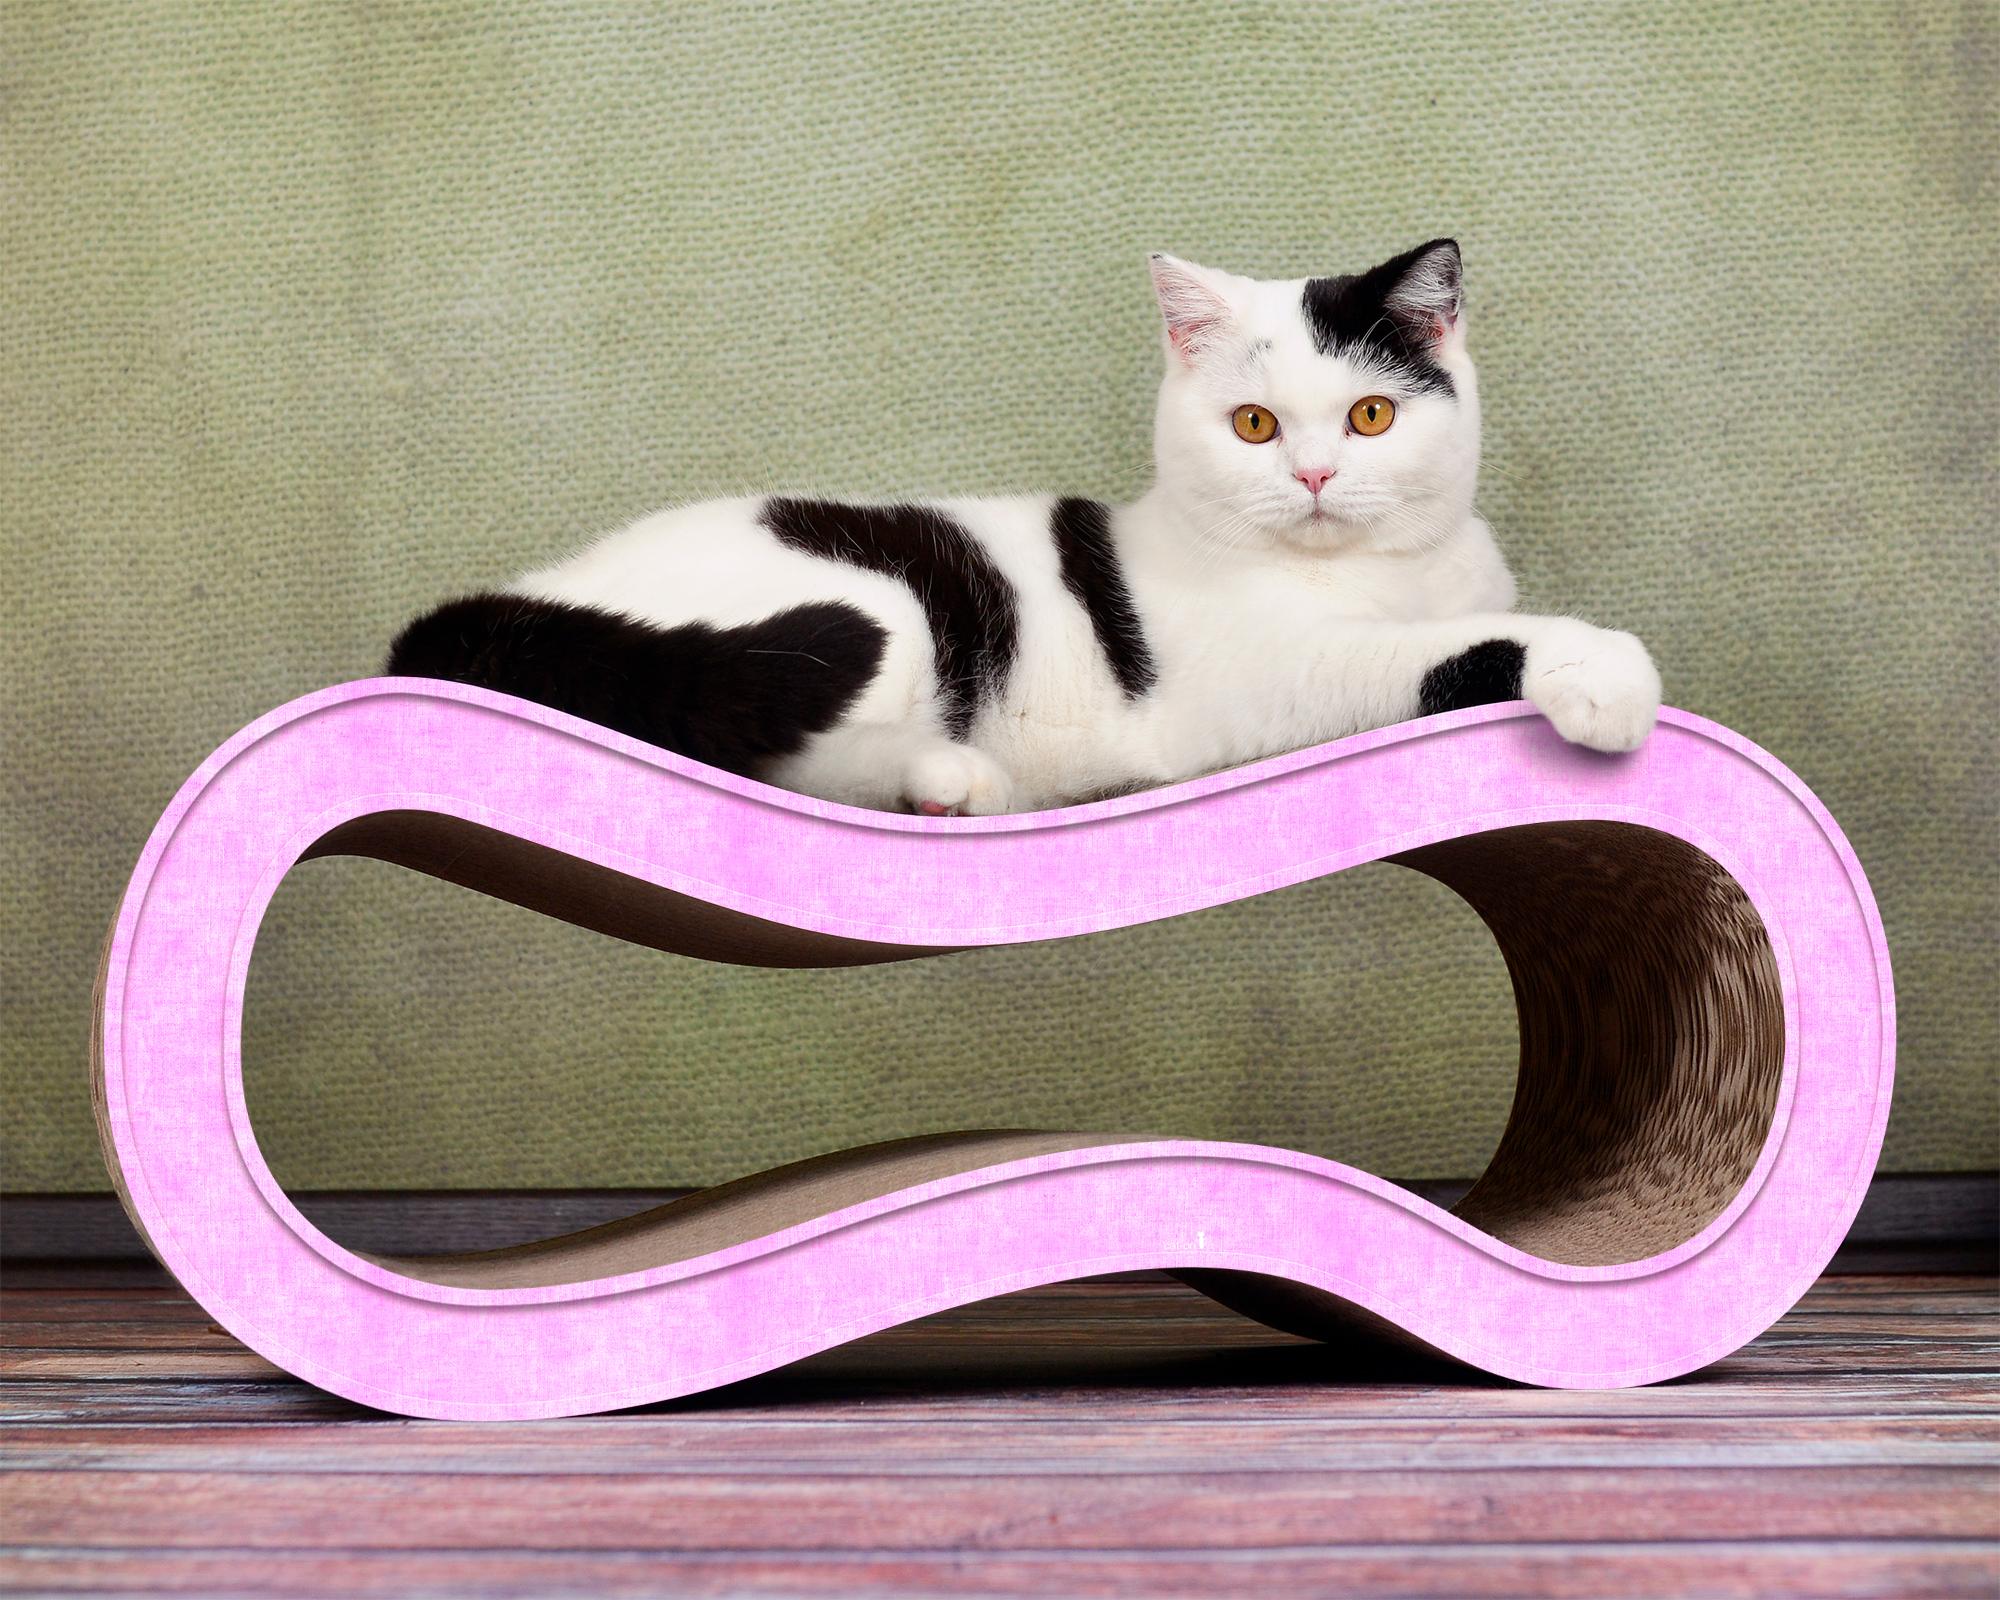 Design Katzenmöbel Singha M in rosa 004g